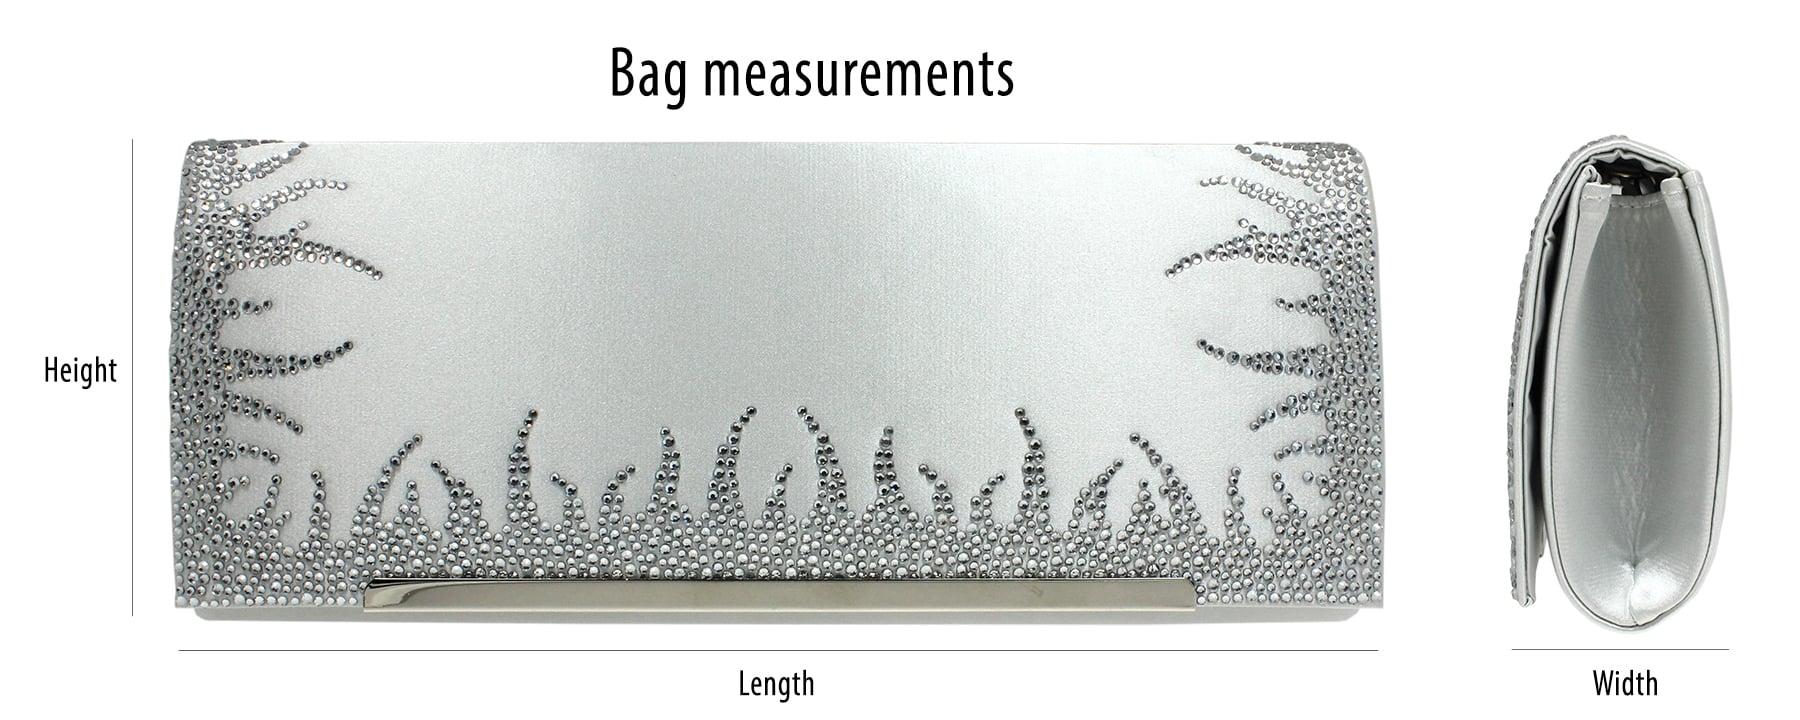 Bag measurements